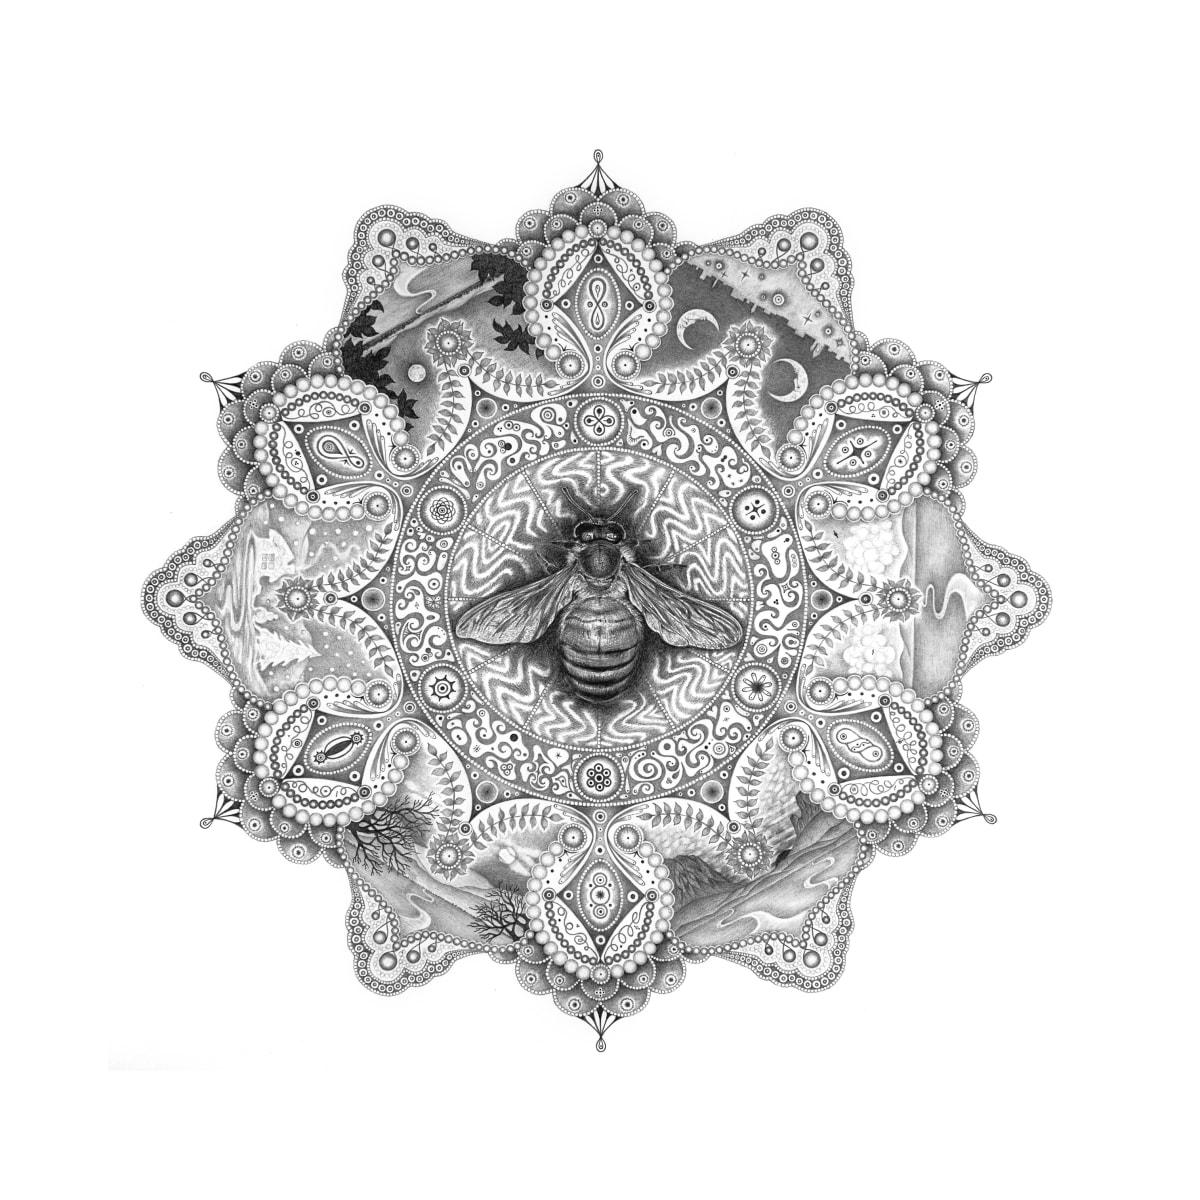 "Michiyo Ihara, Snowflakes #99 ""Pollinator"", 2013"